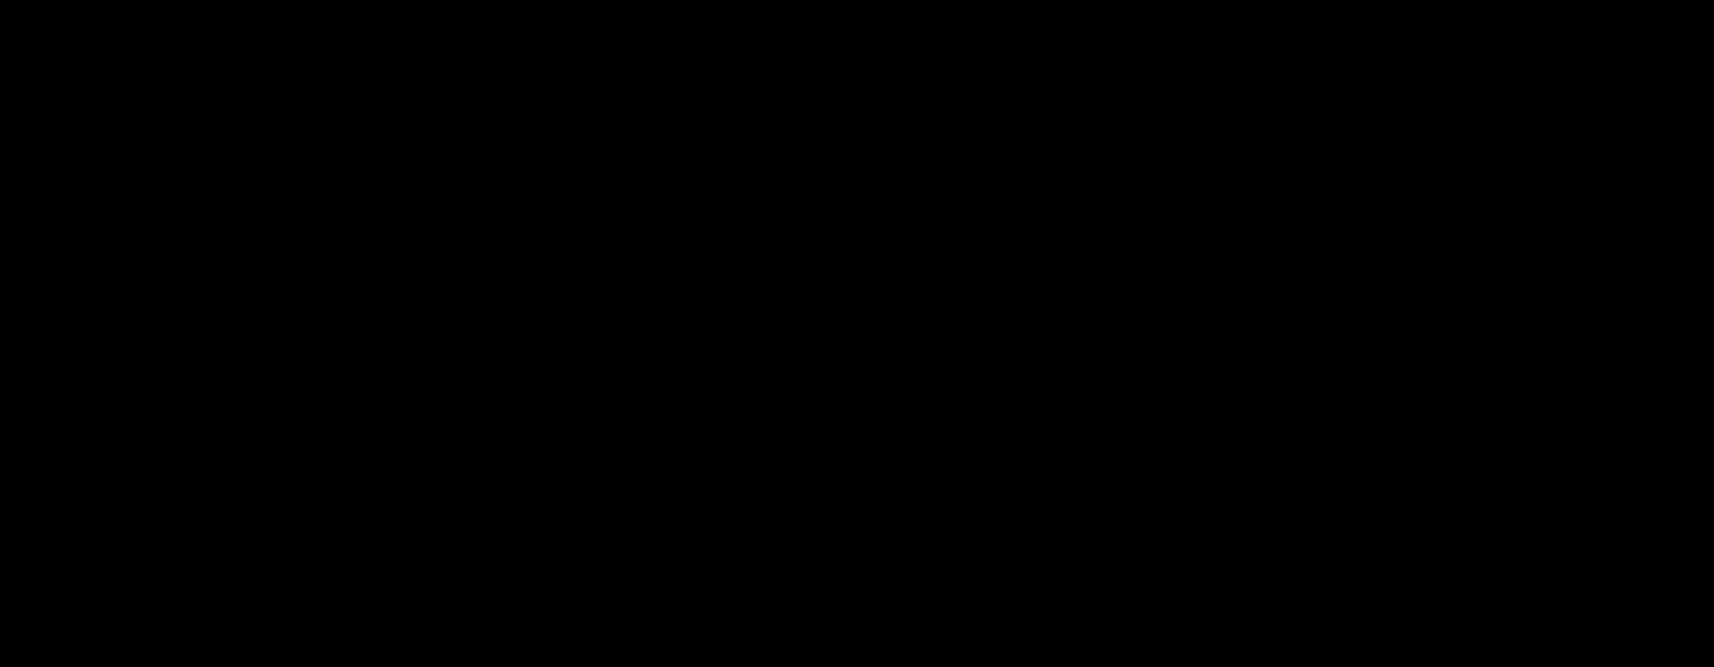 1 (9)